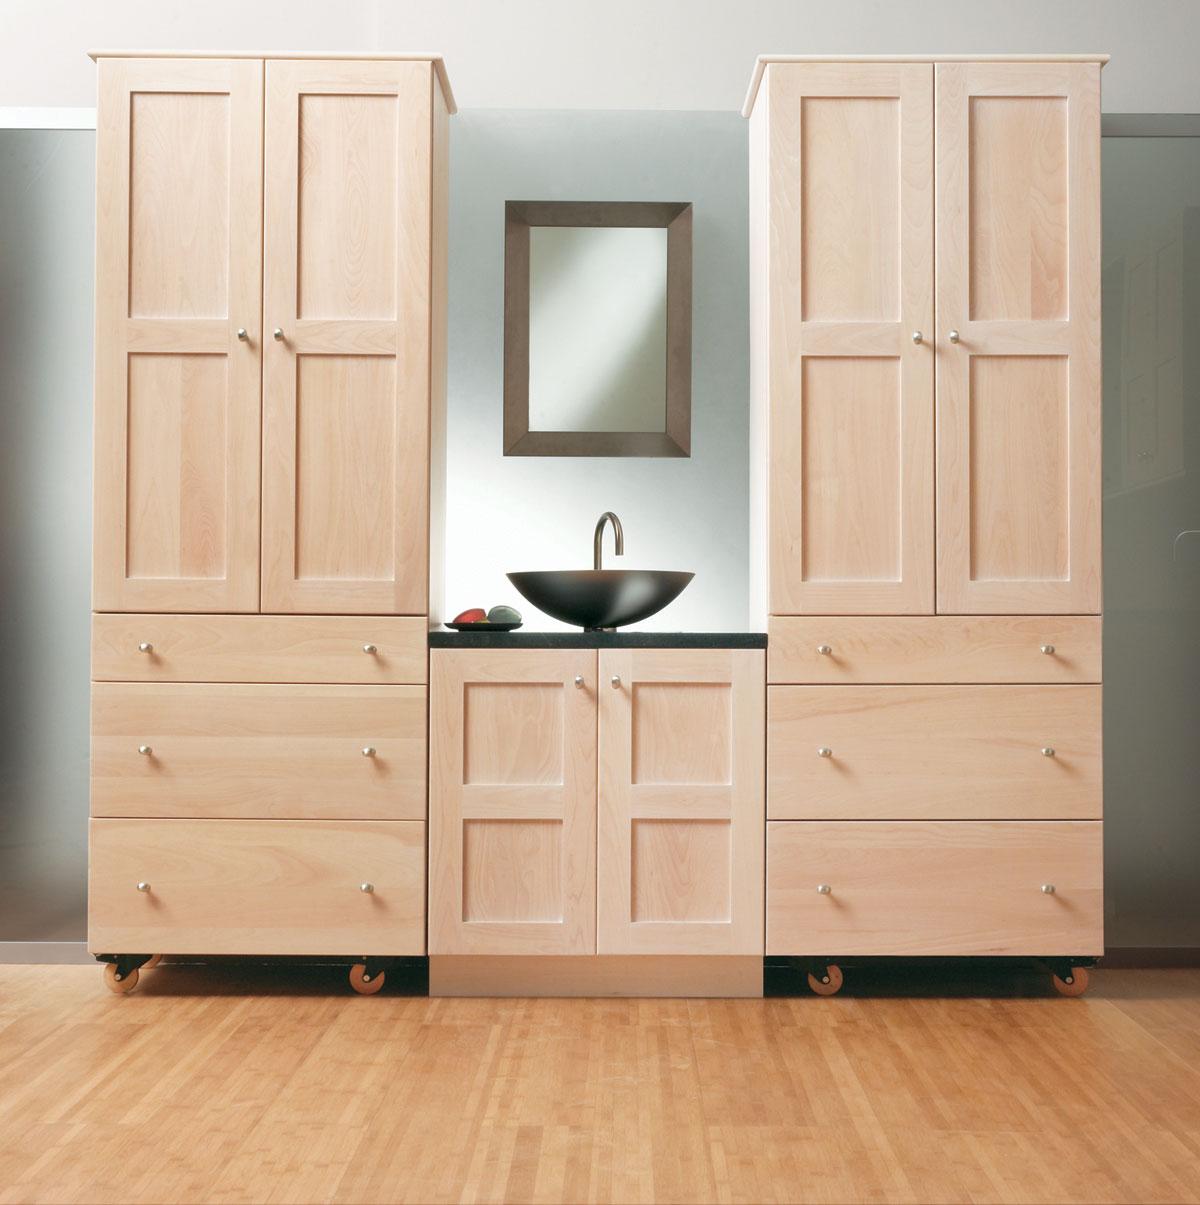 door knobs kitchen cabinets photo - 18